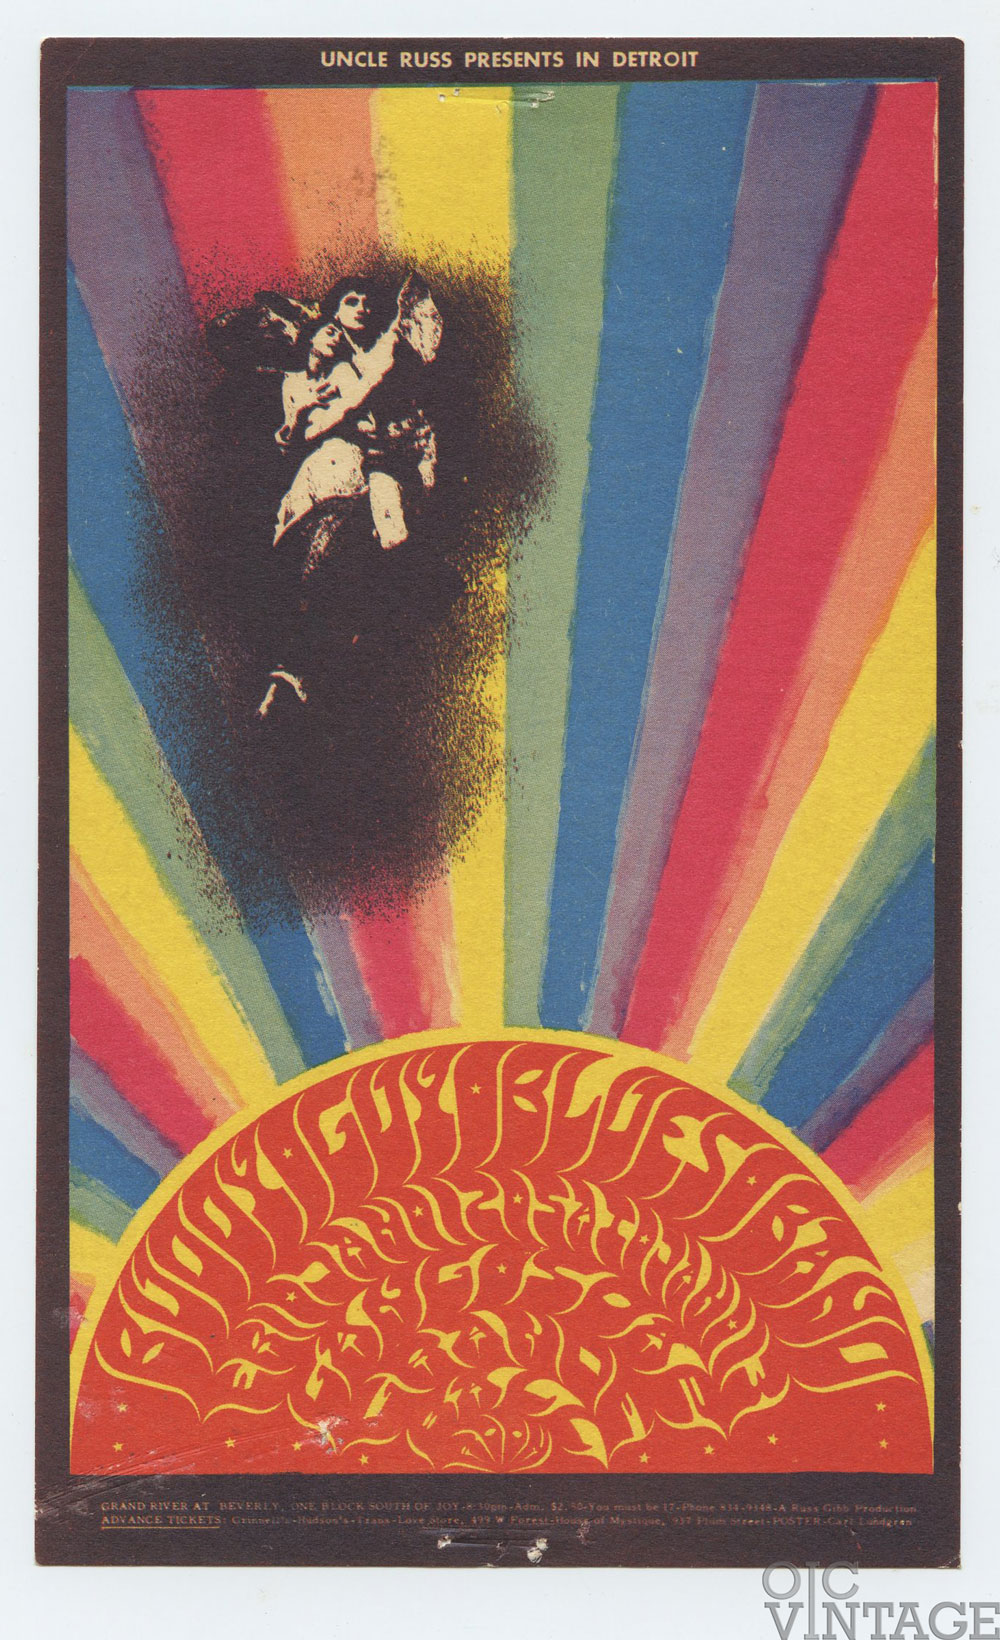 Grande Ballroom Postcard 1968 Jan 12 Postcard Buddy Guy